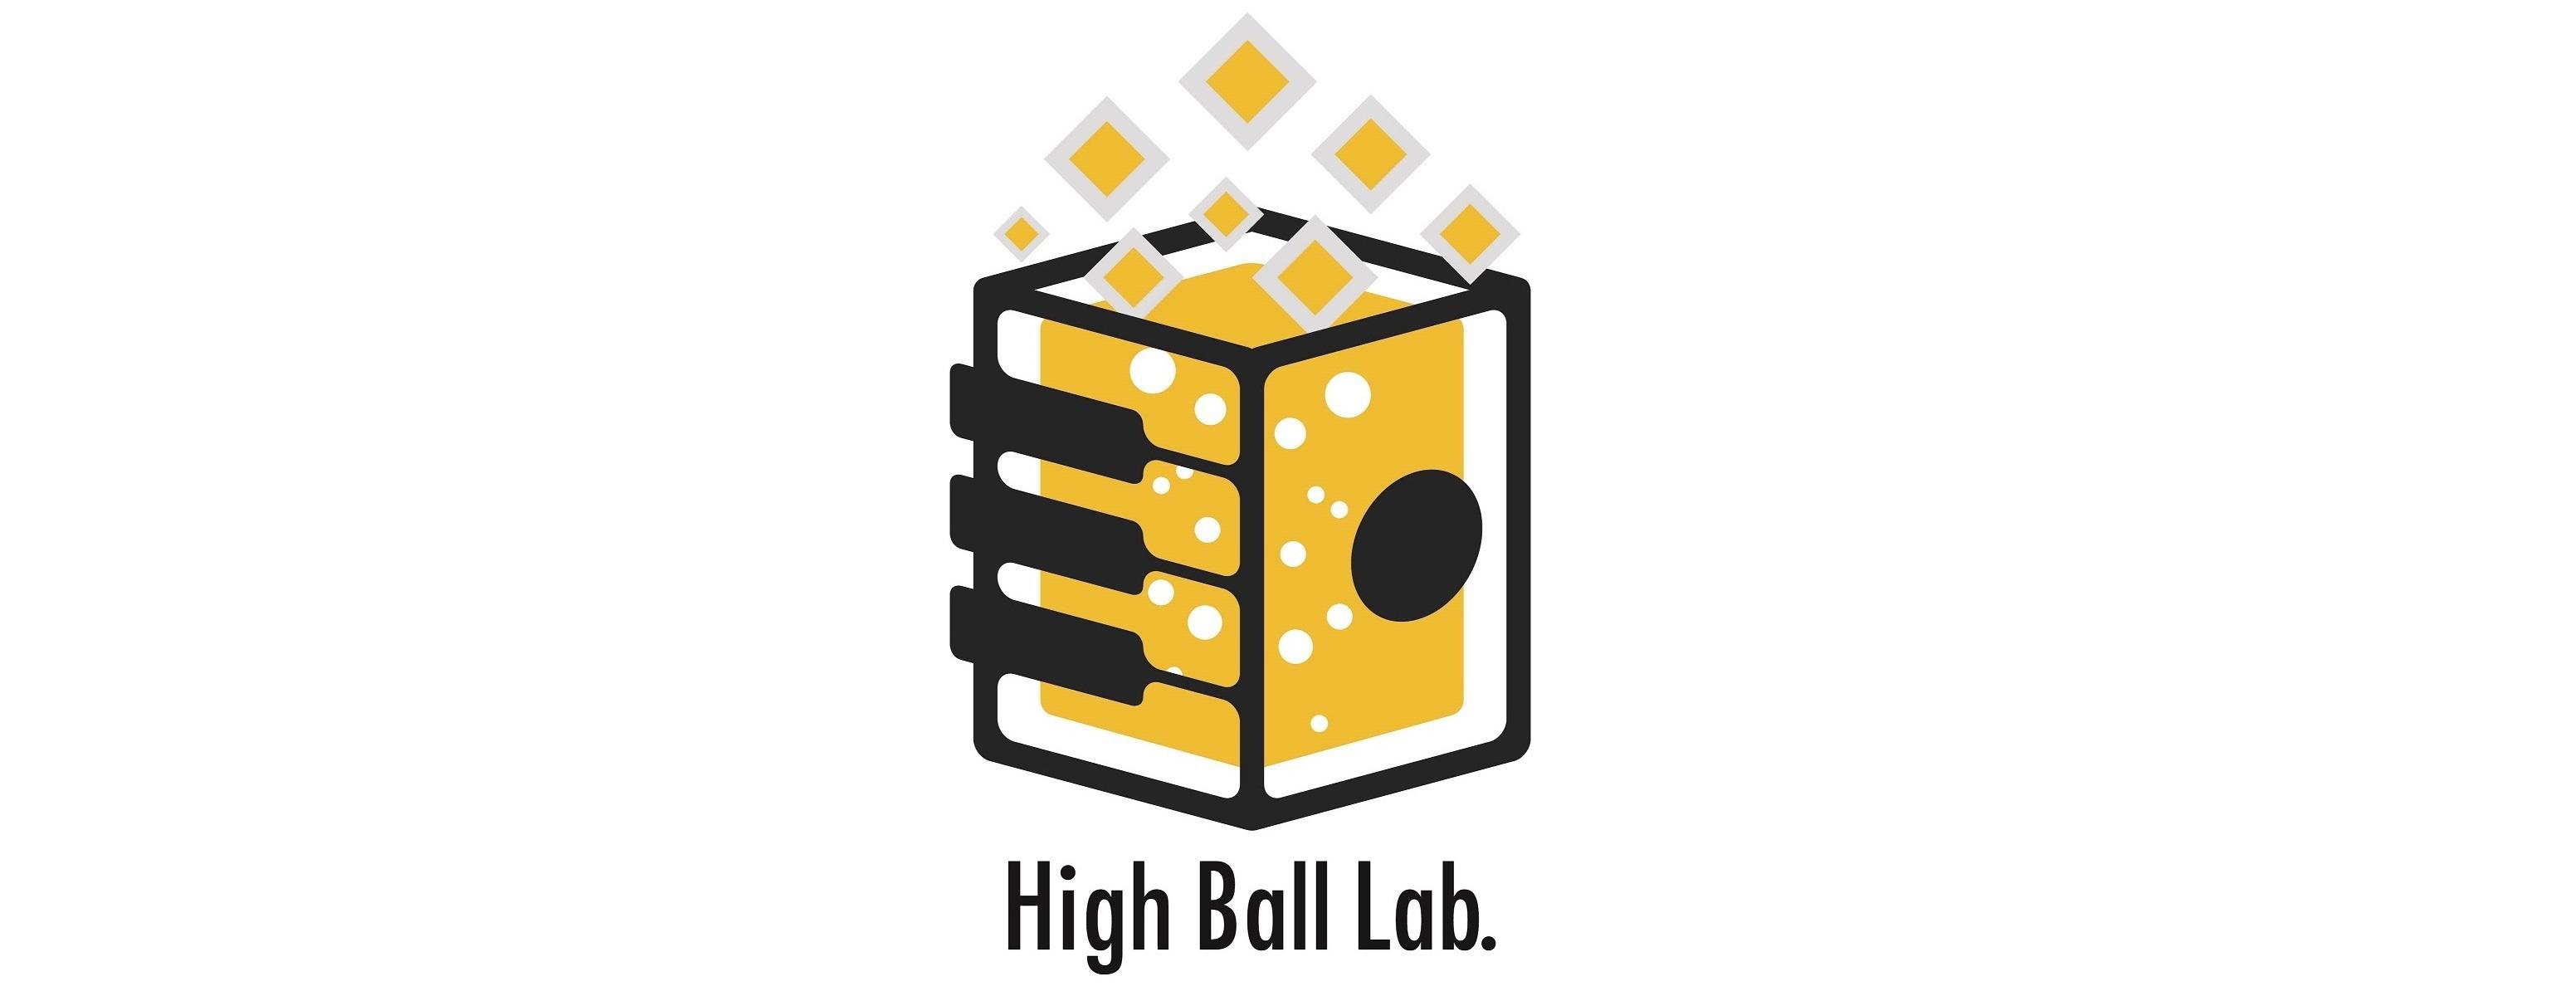 High Ball Lab.